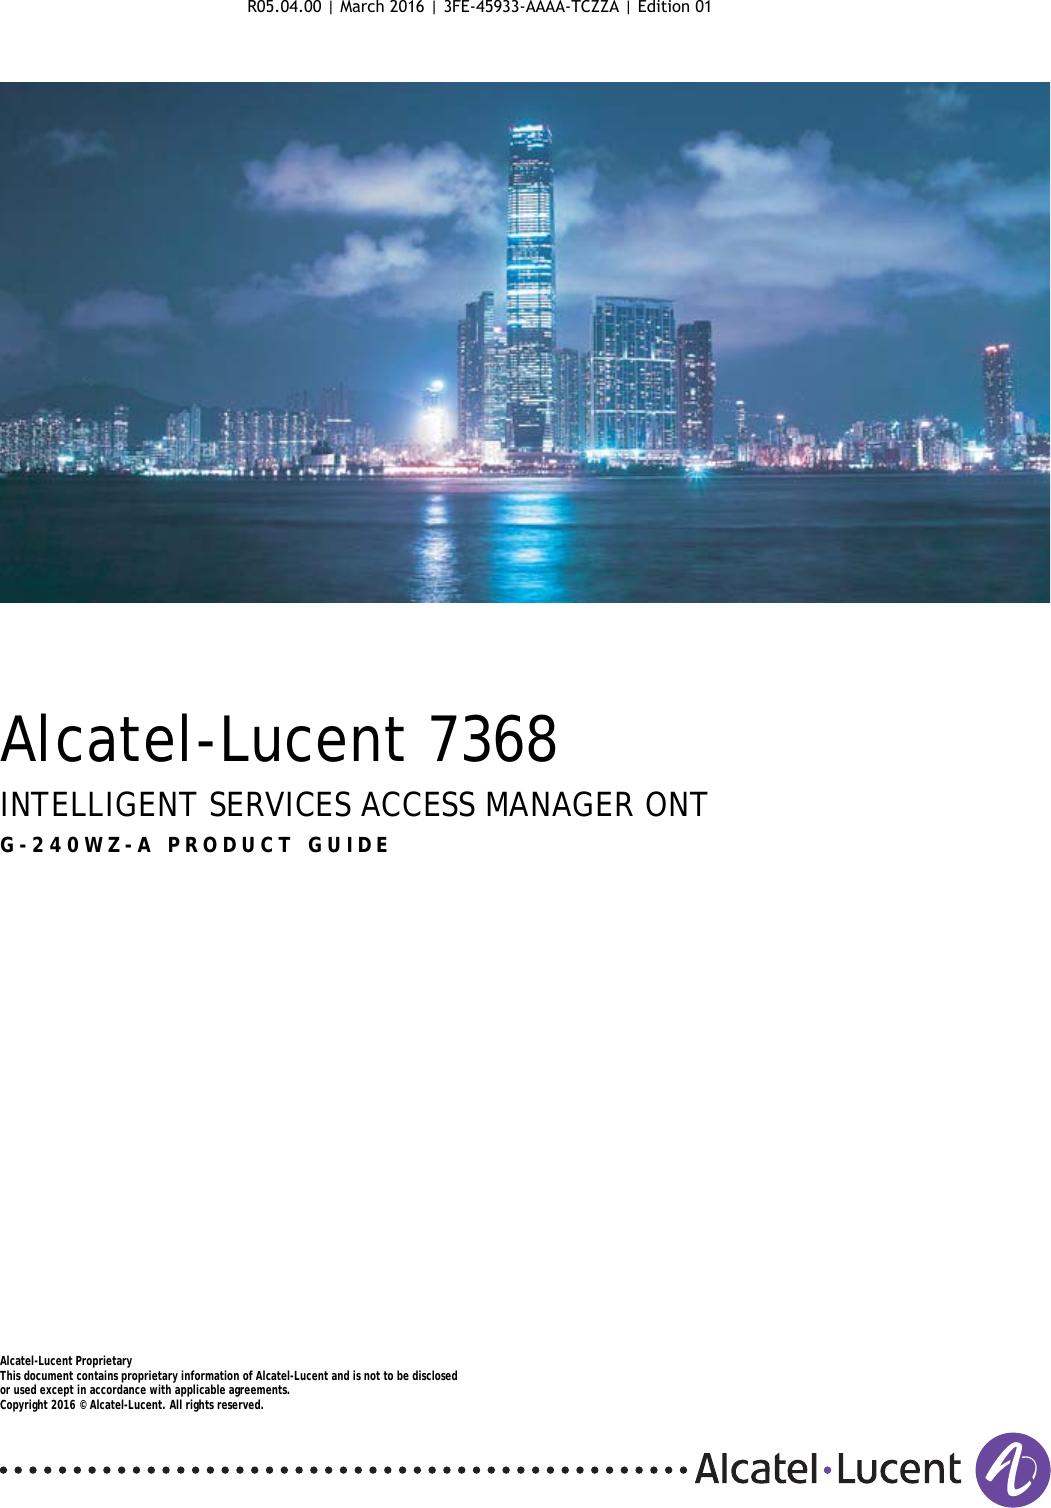 Alcatel Lucent Bell G240WZA Digital Home ONU User Manual 7368 ISAM